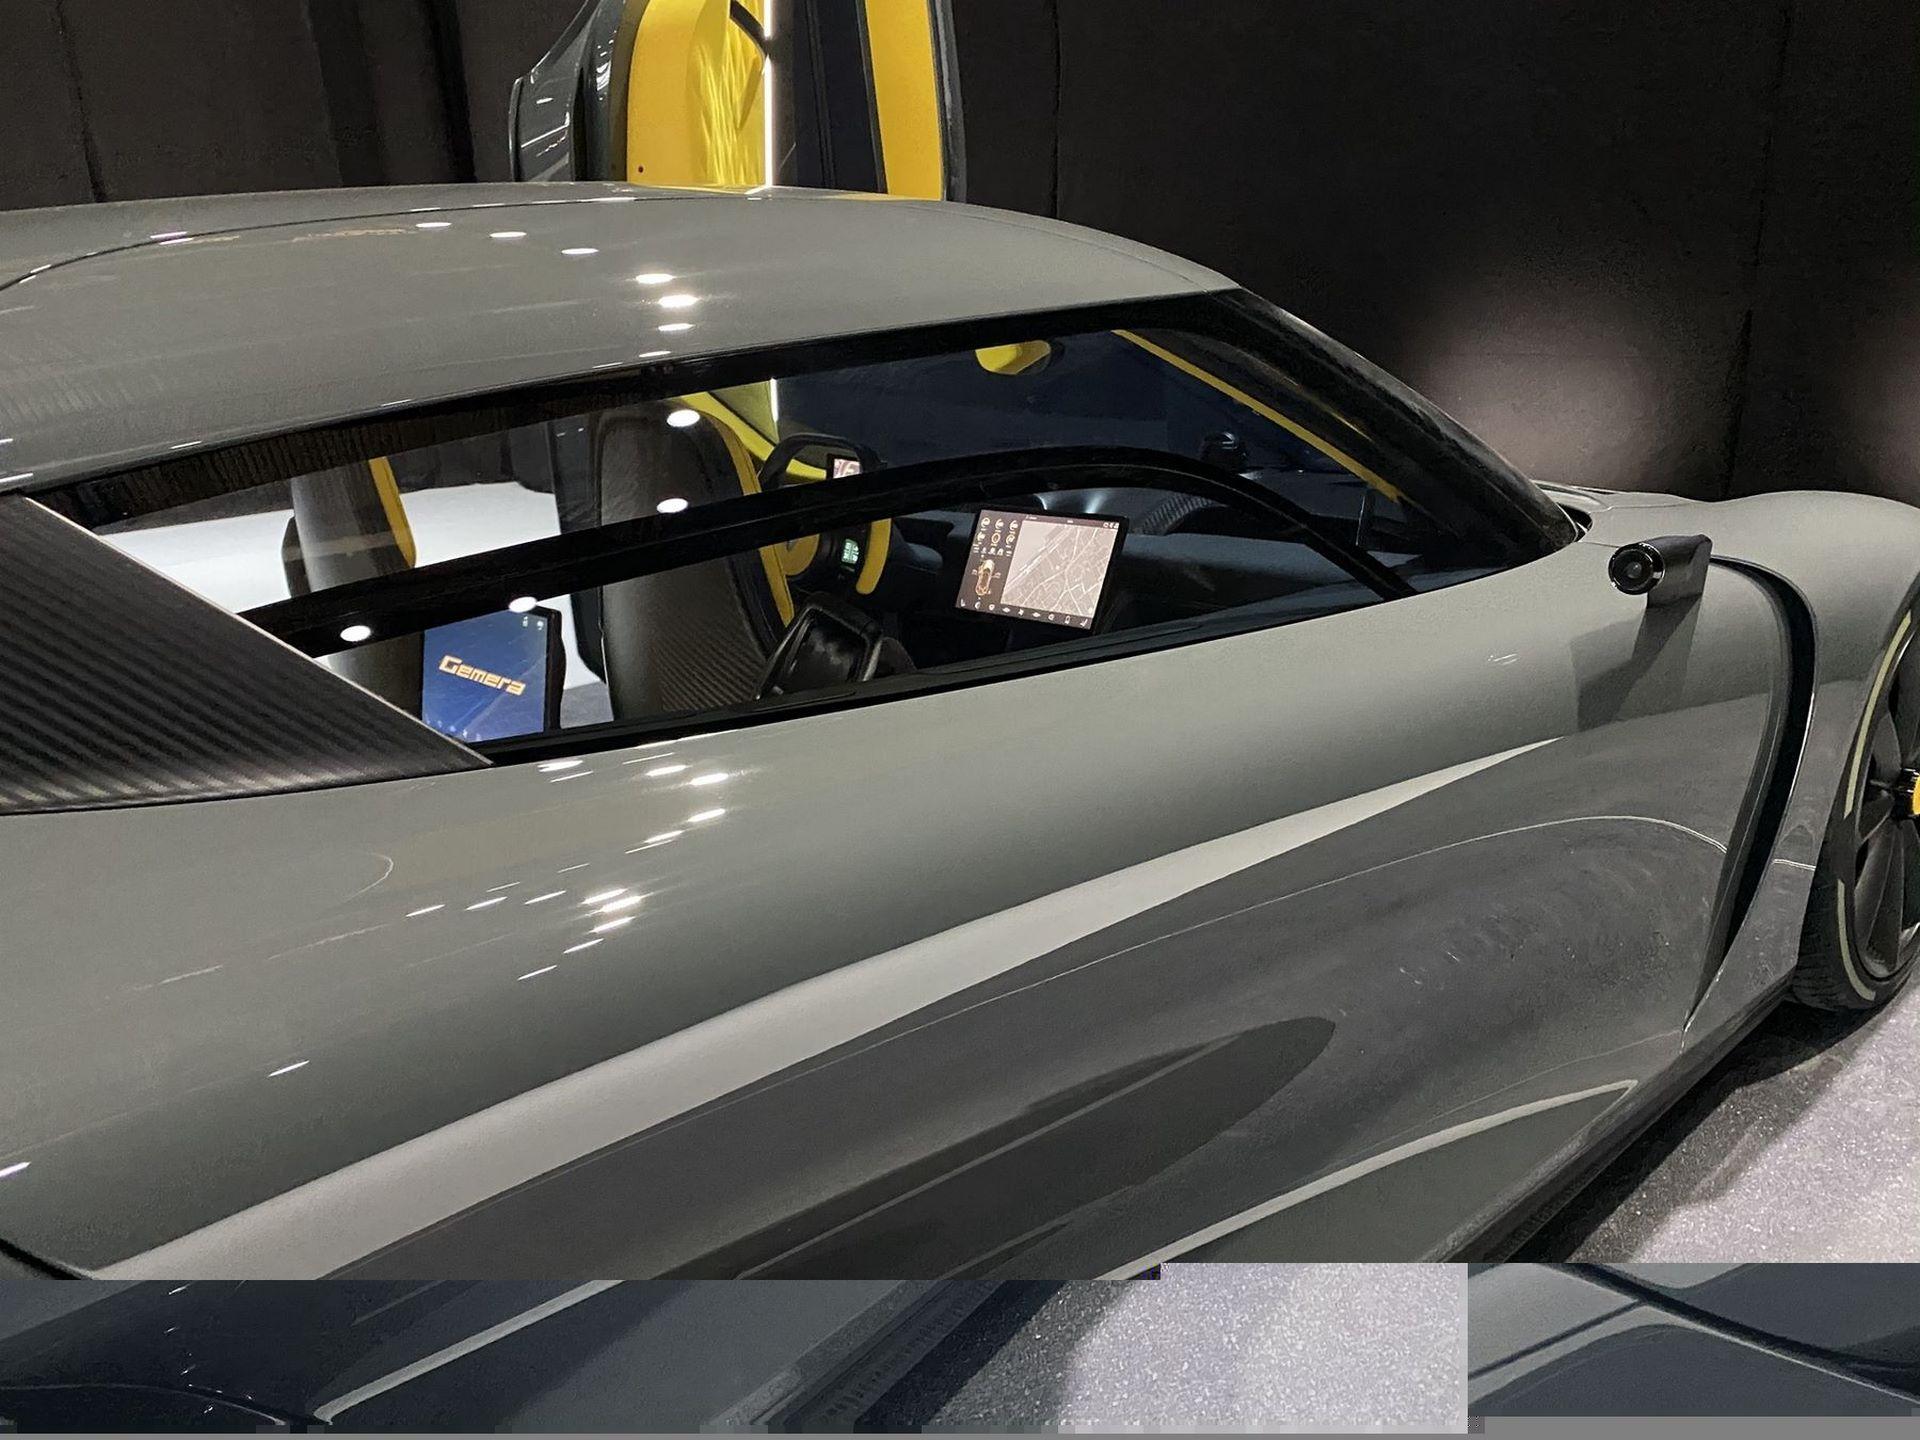 Geneva motor show 2020 (16)